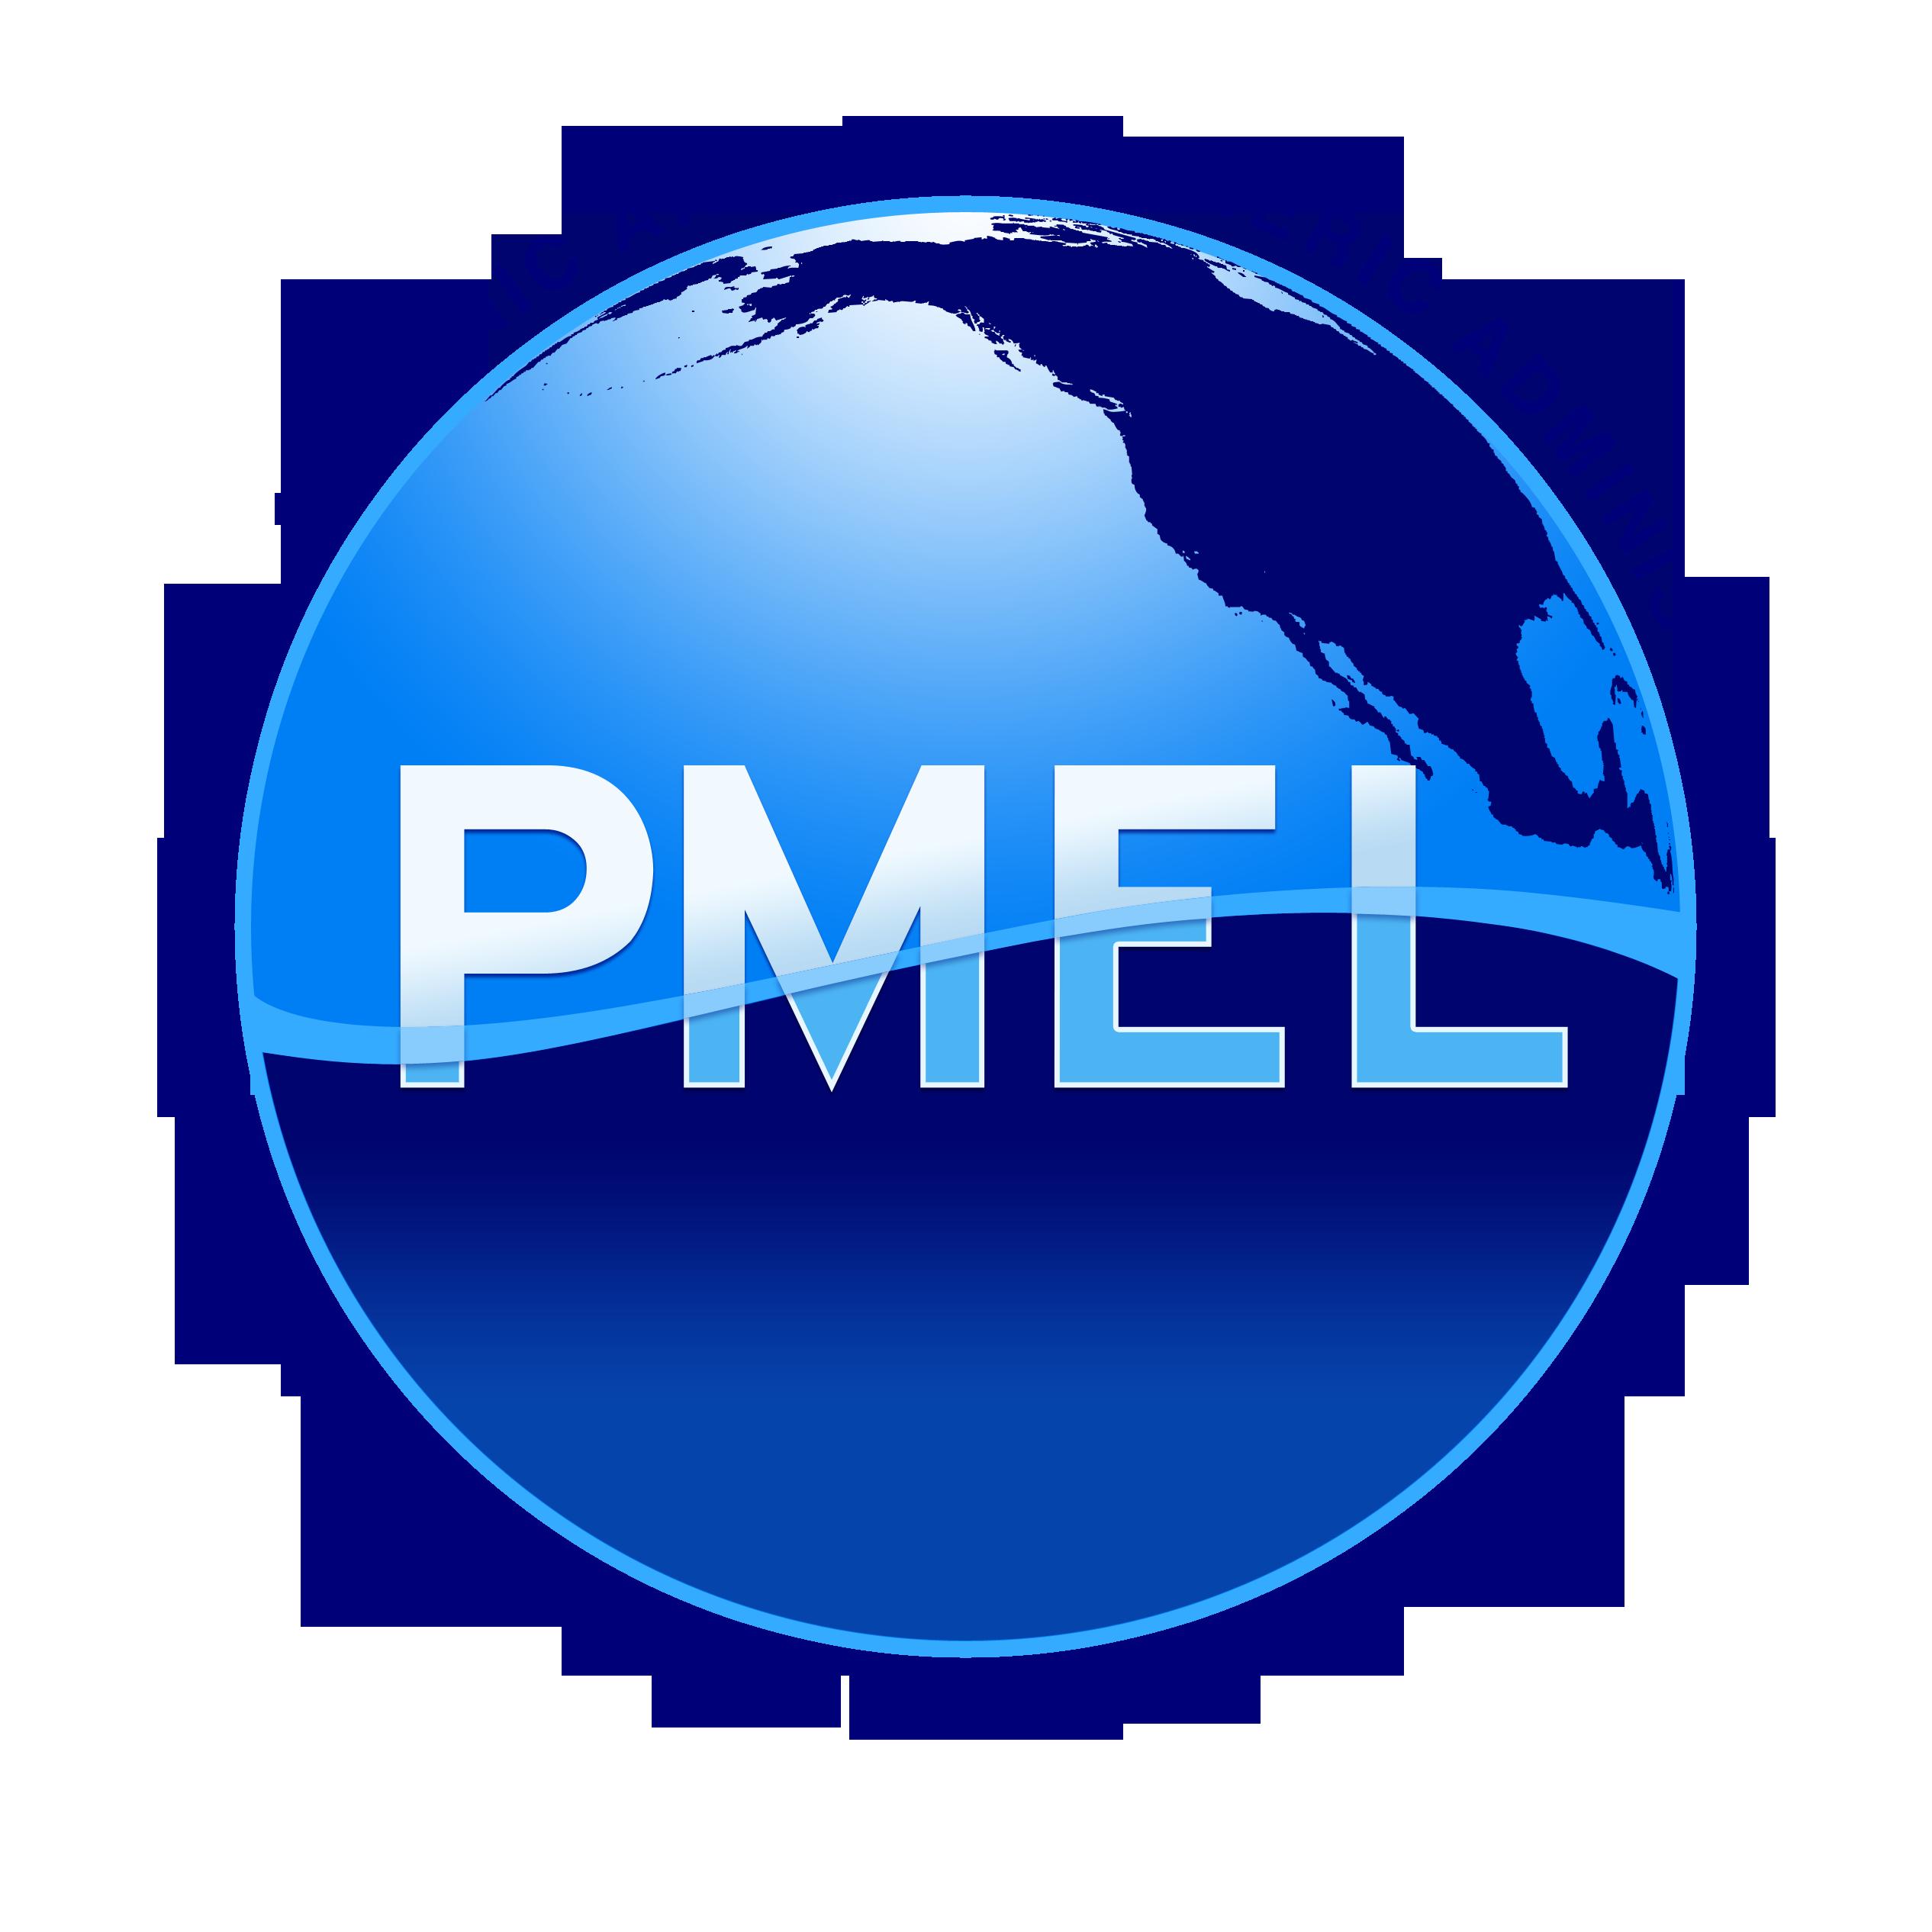 Pmel Itu Database 2016